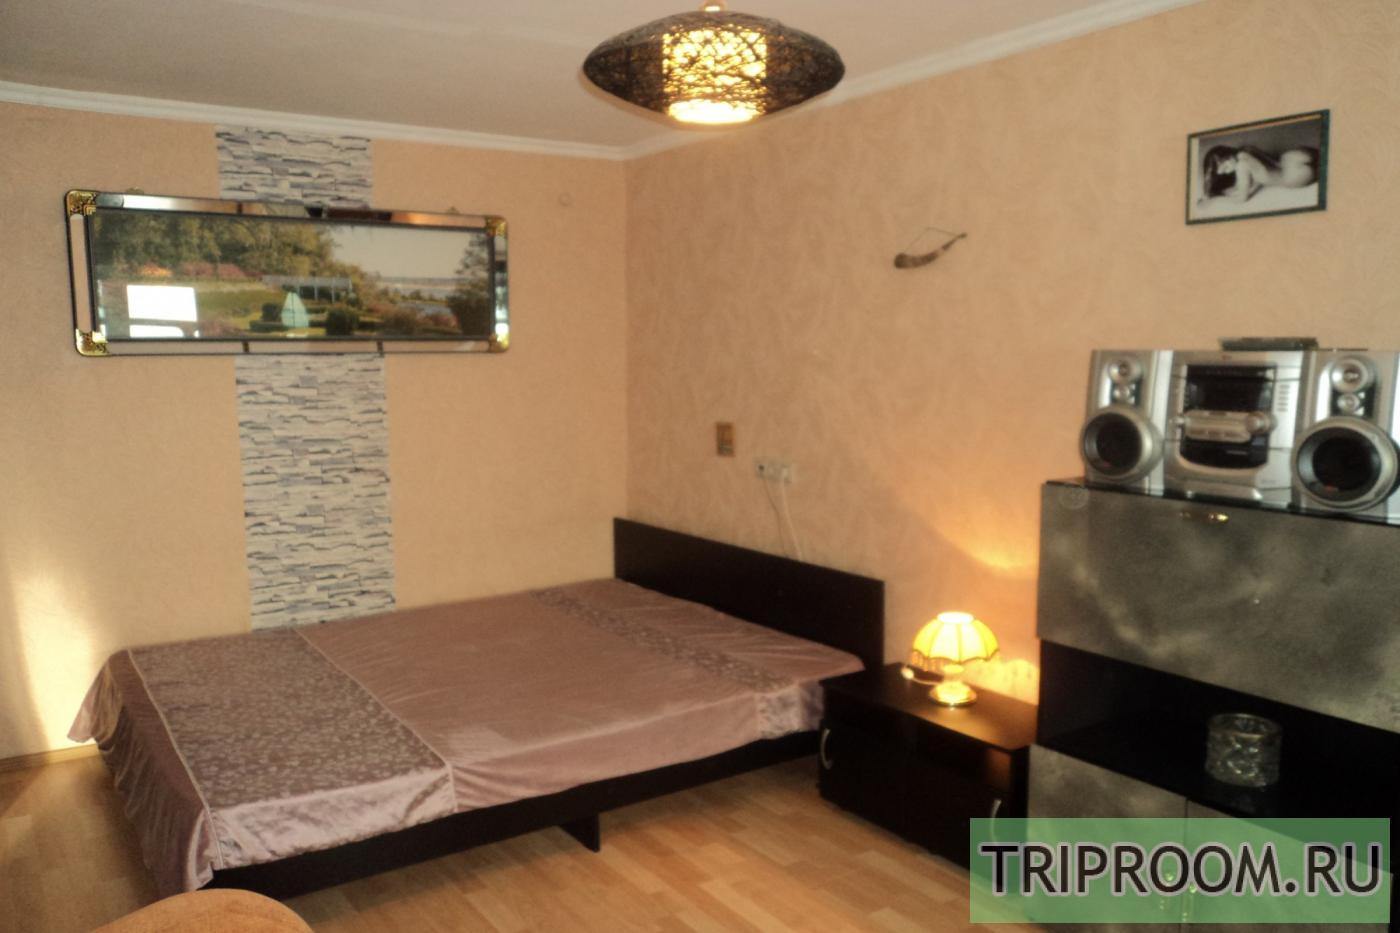 1-комнатная квартира посуточно (вариант № 5701), ул. Челюскинцев улица, фото № 1